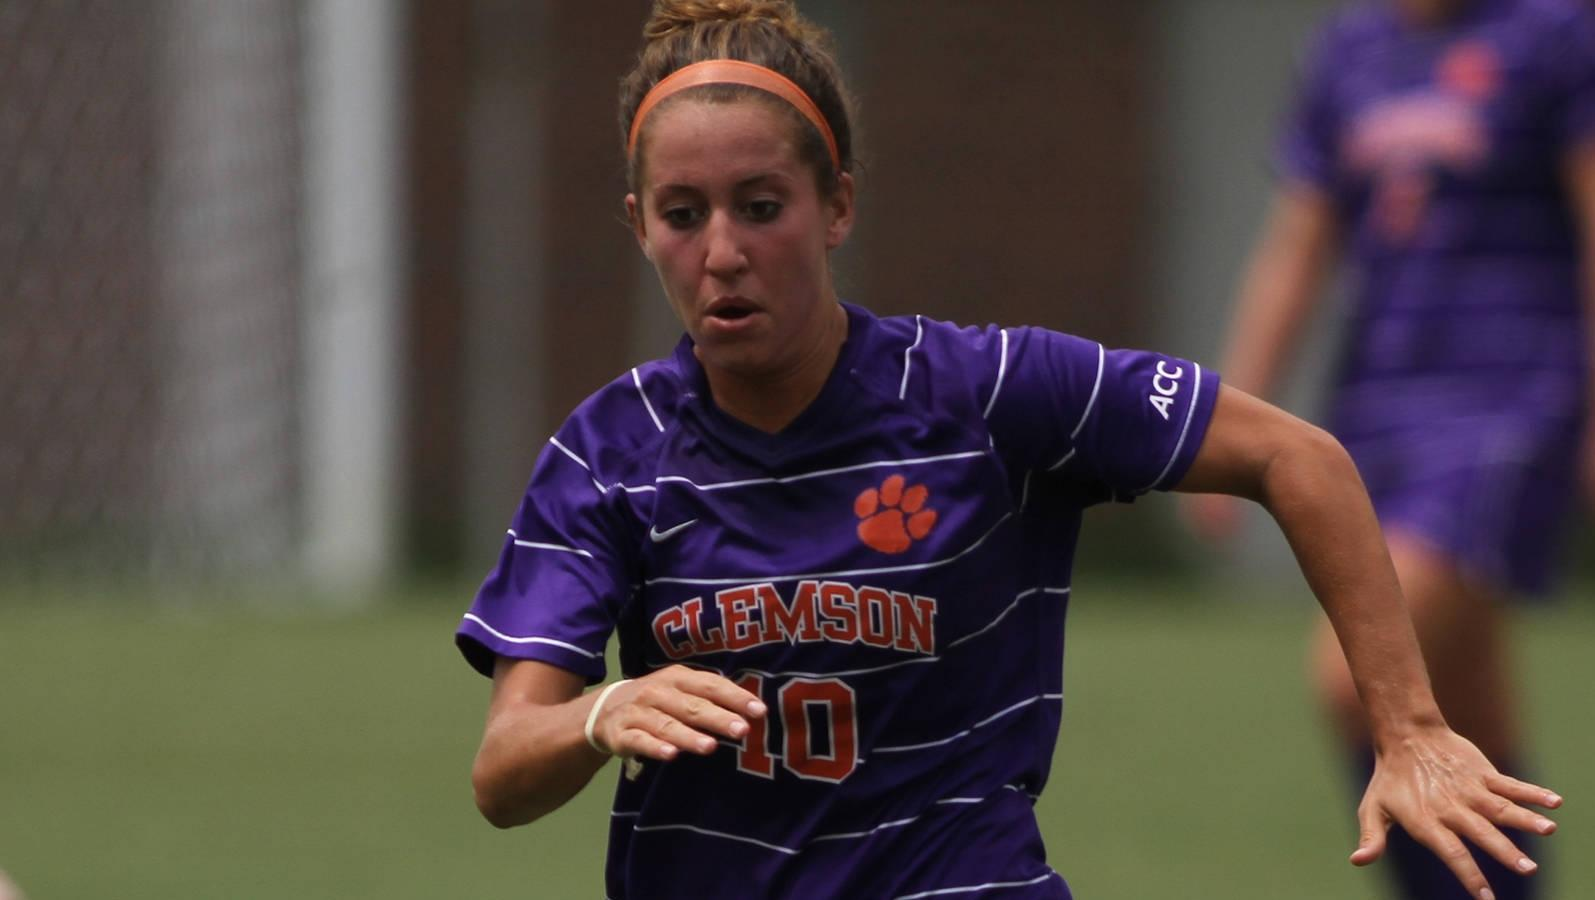 Clemson Women's Soccer Program Announces 2013 Schedule